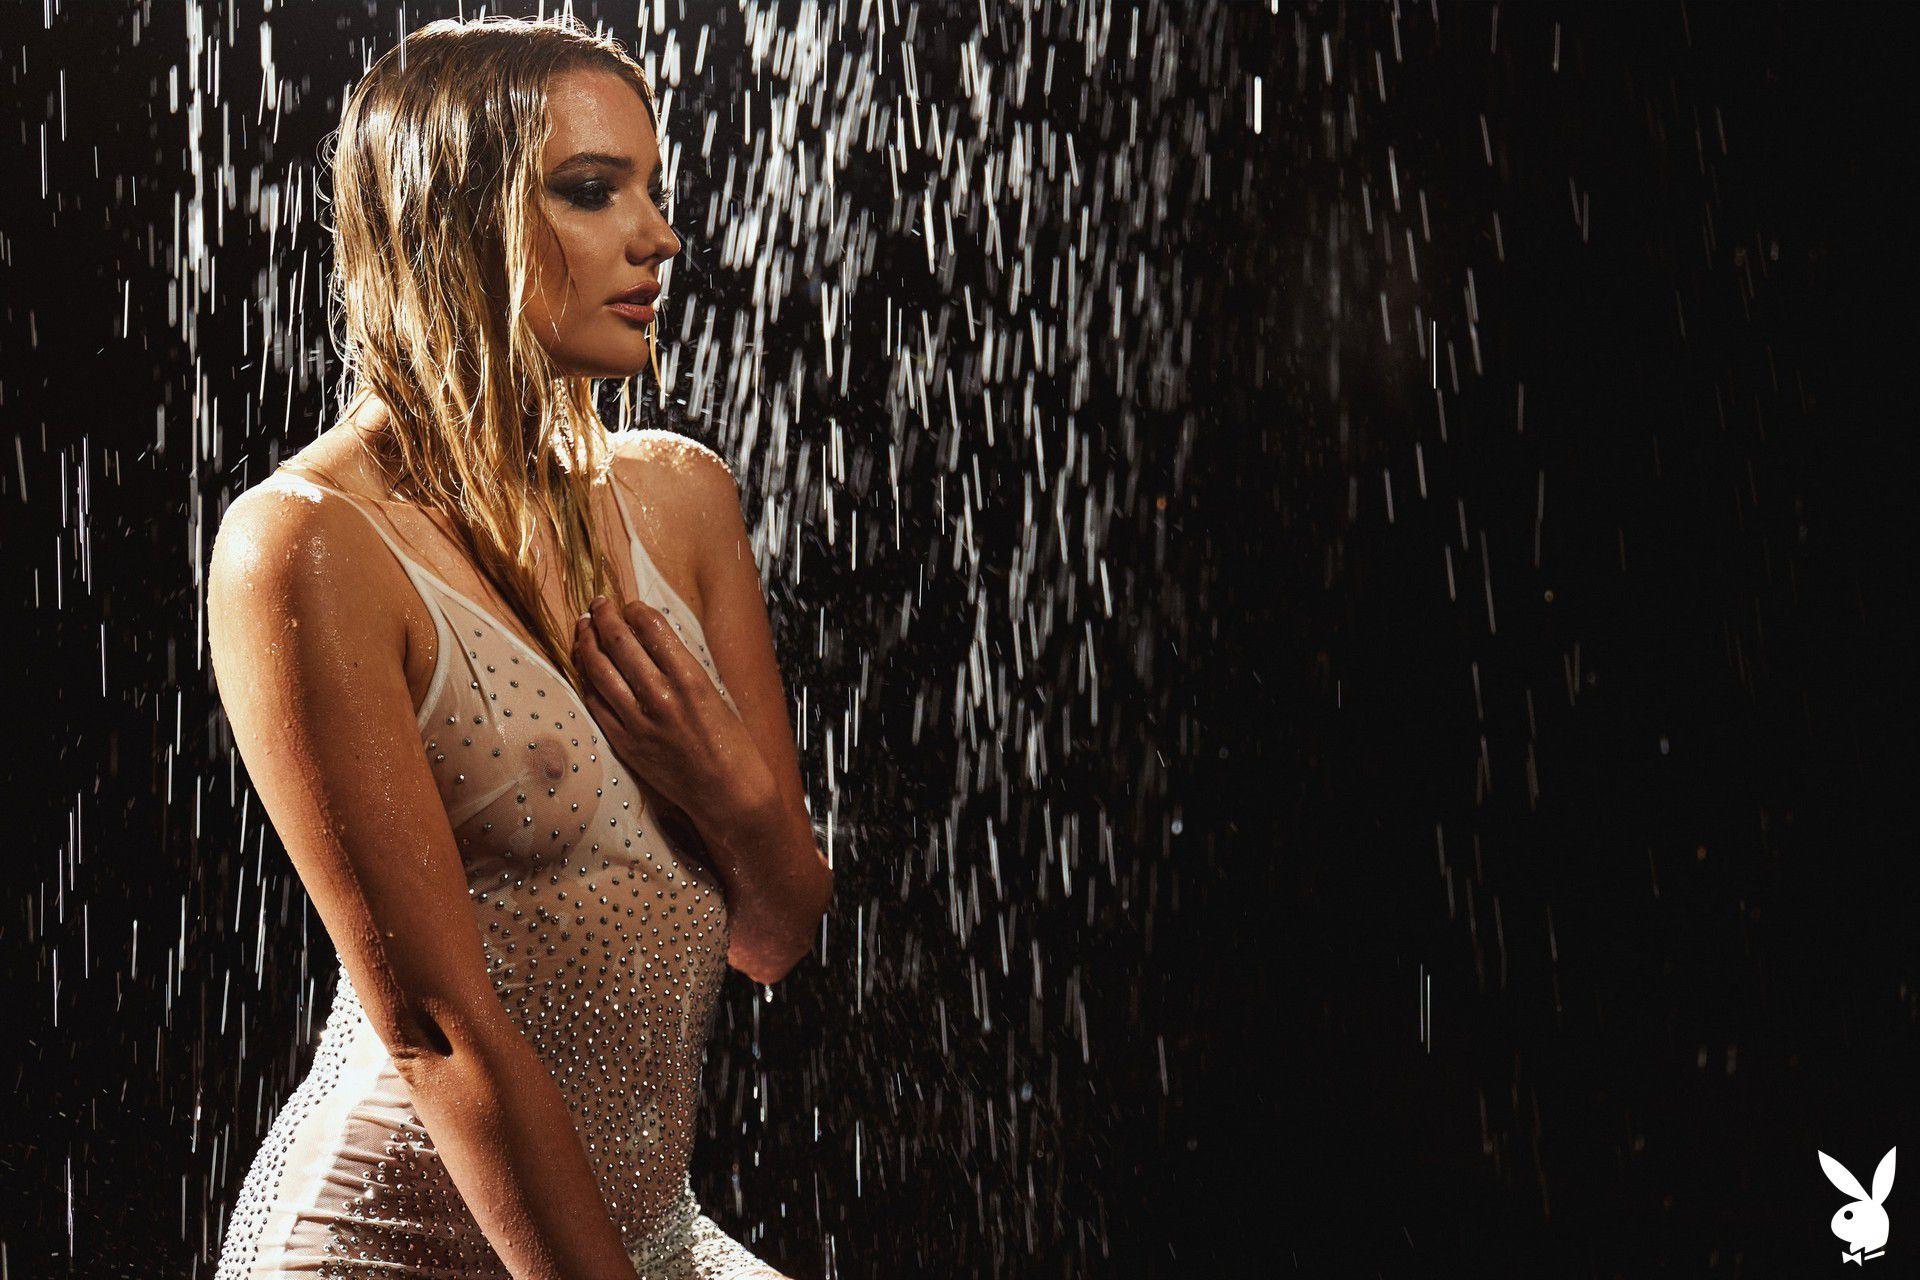 Kenna James Naked Playboy Shoot